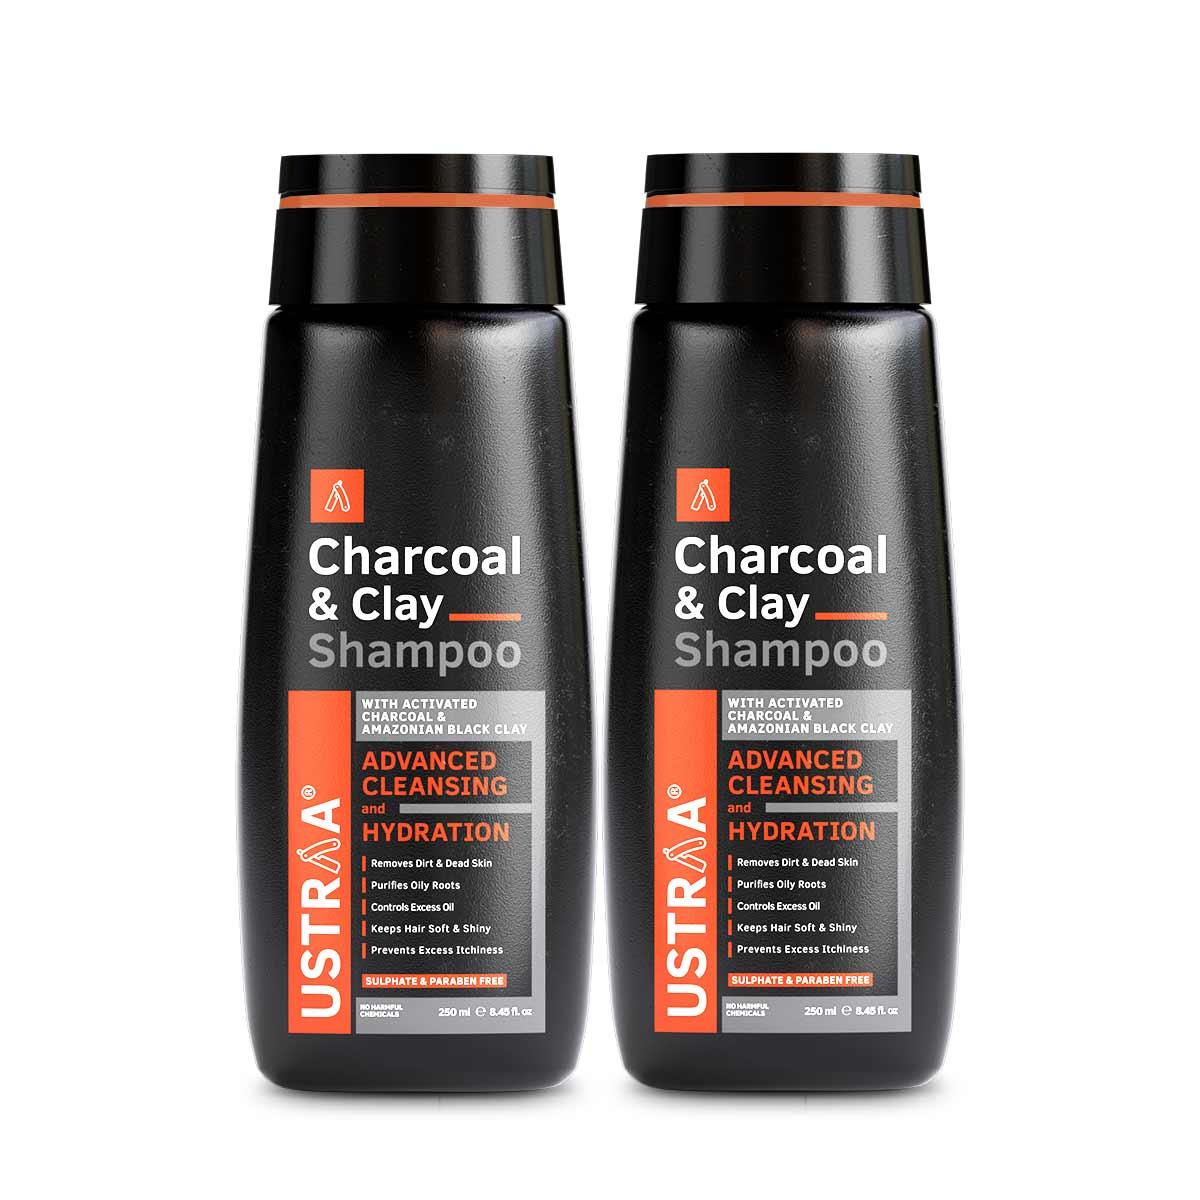 Charcoal & Clay Shampoo - Set of 2